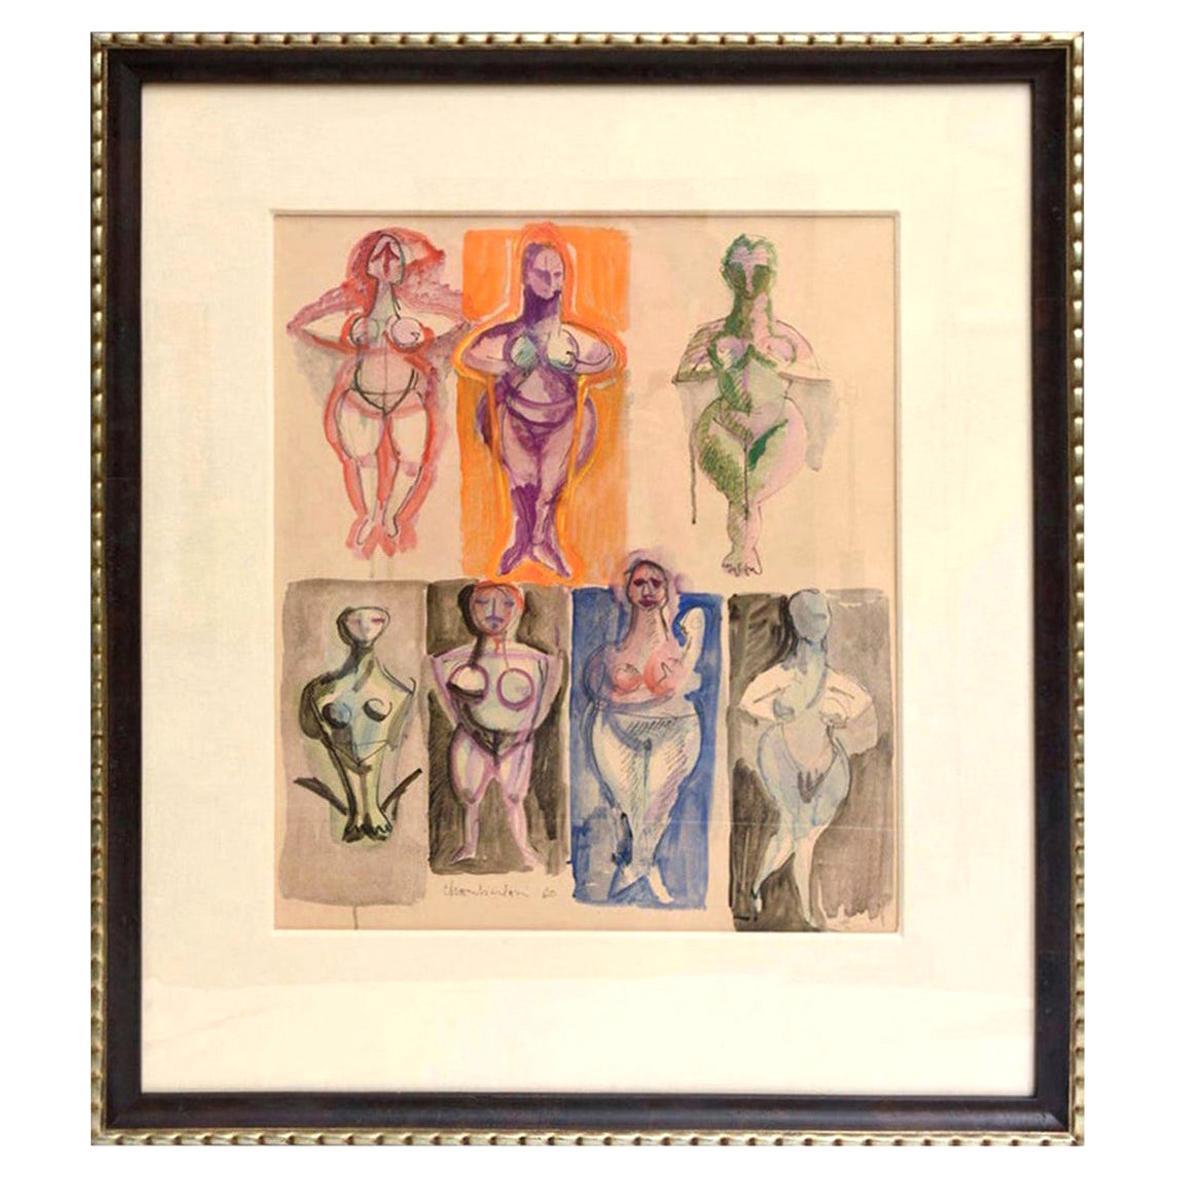 Chamberlain Signed Watercolor Mid-Century Modern Custom Museum Framed